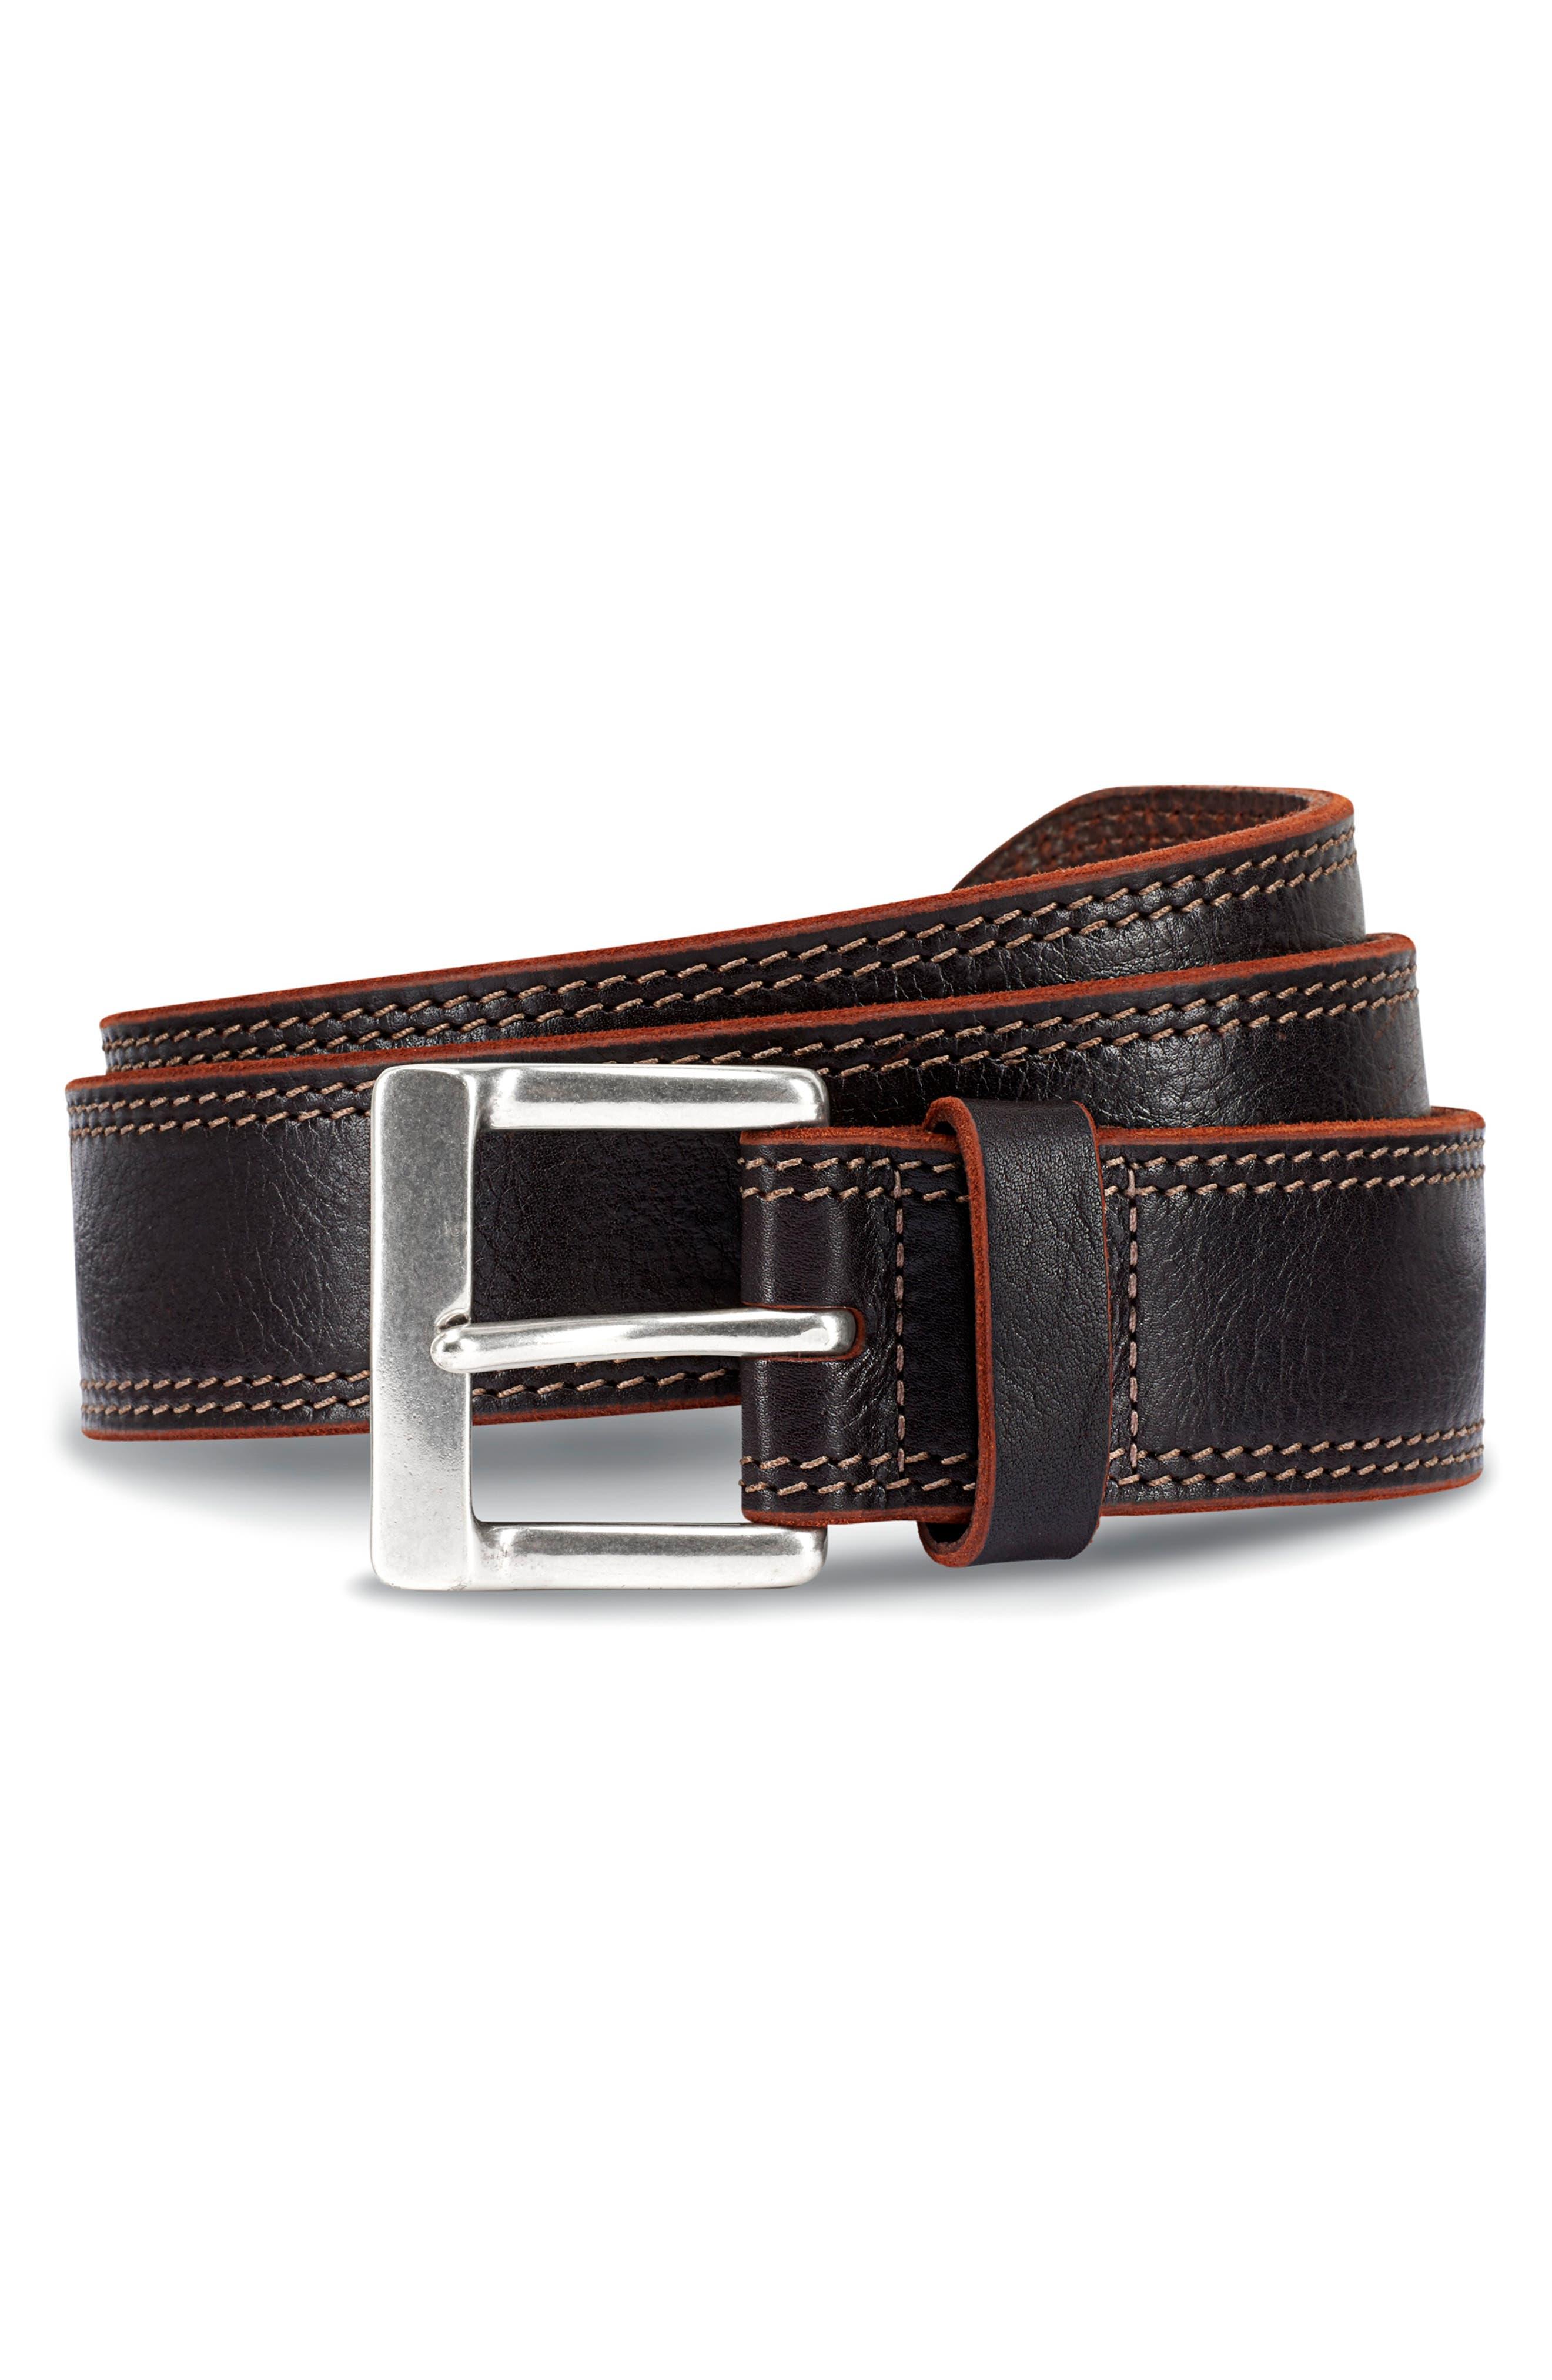 ALLEN EDMONDS Quay Avenue Leather Belt, Main, color, DARK BROWN